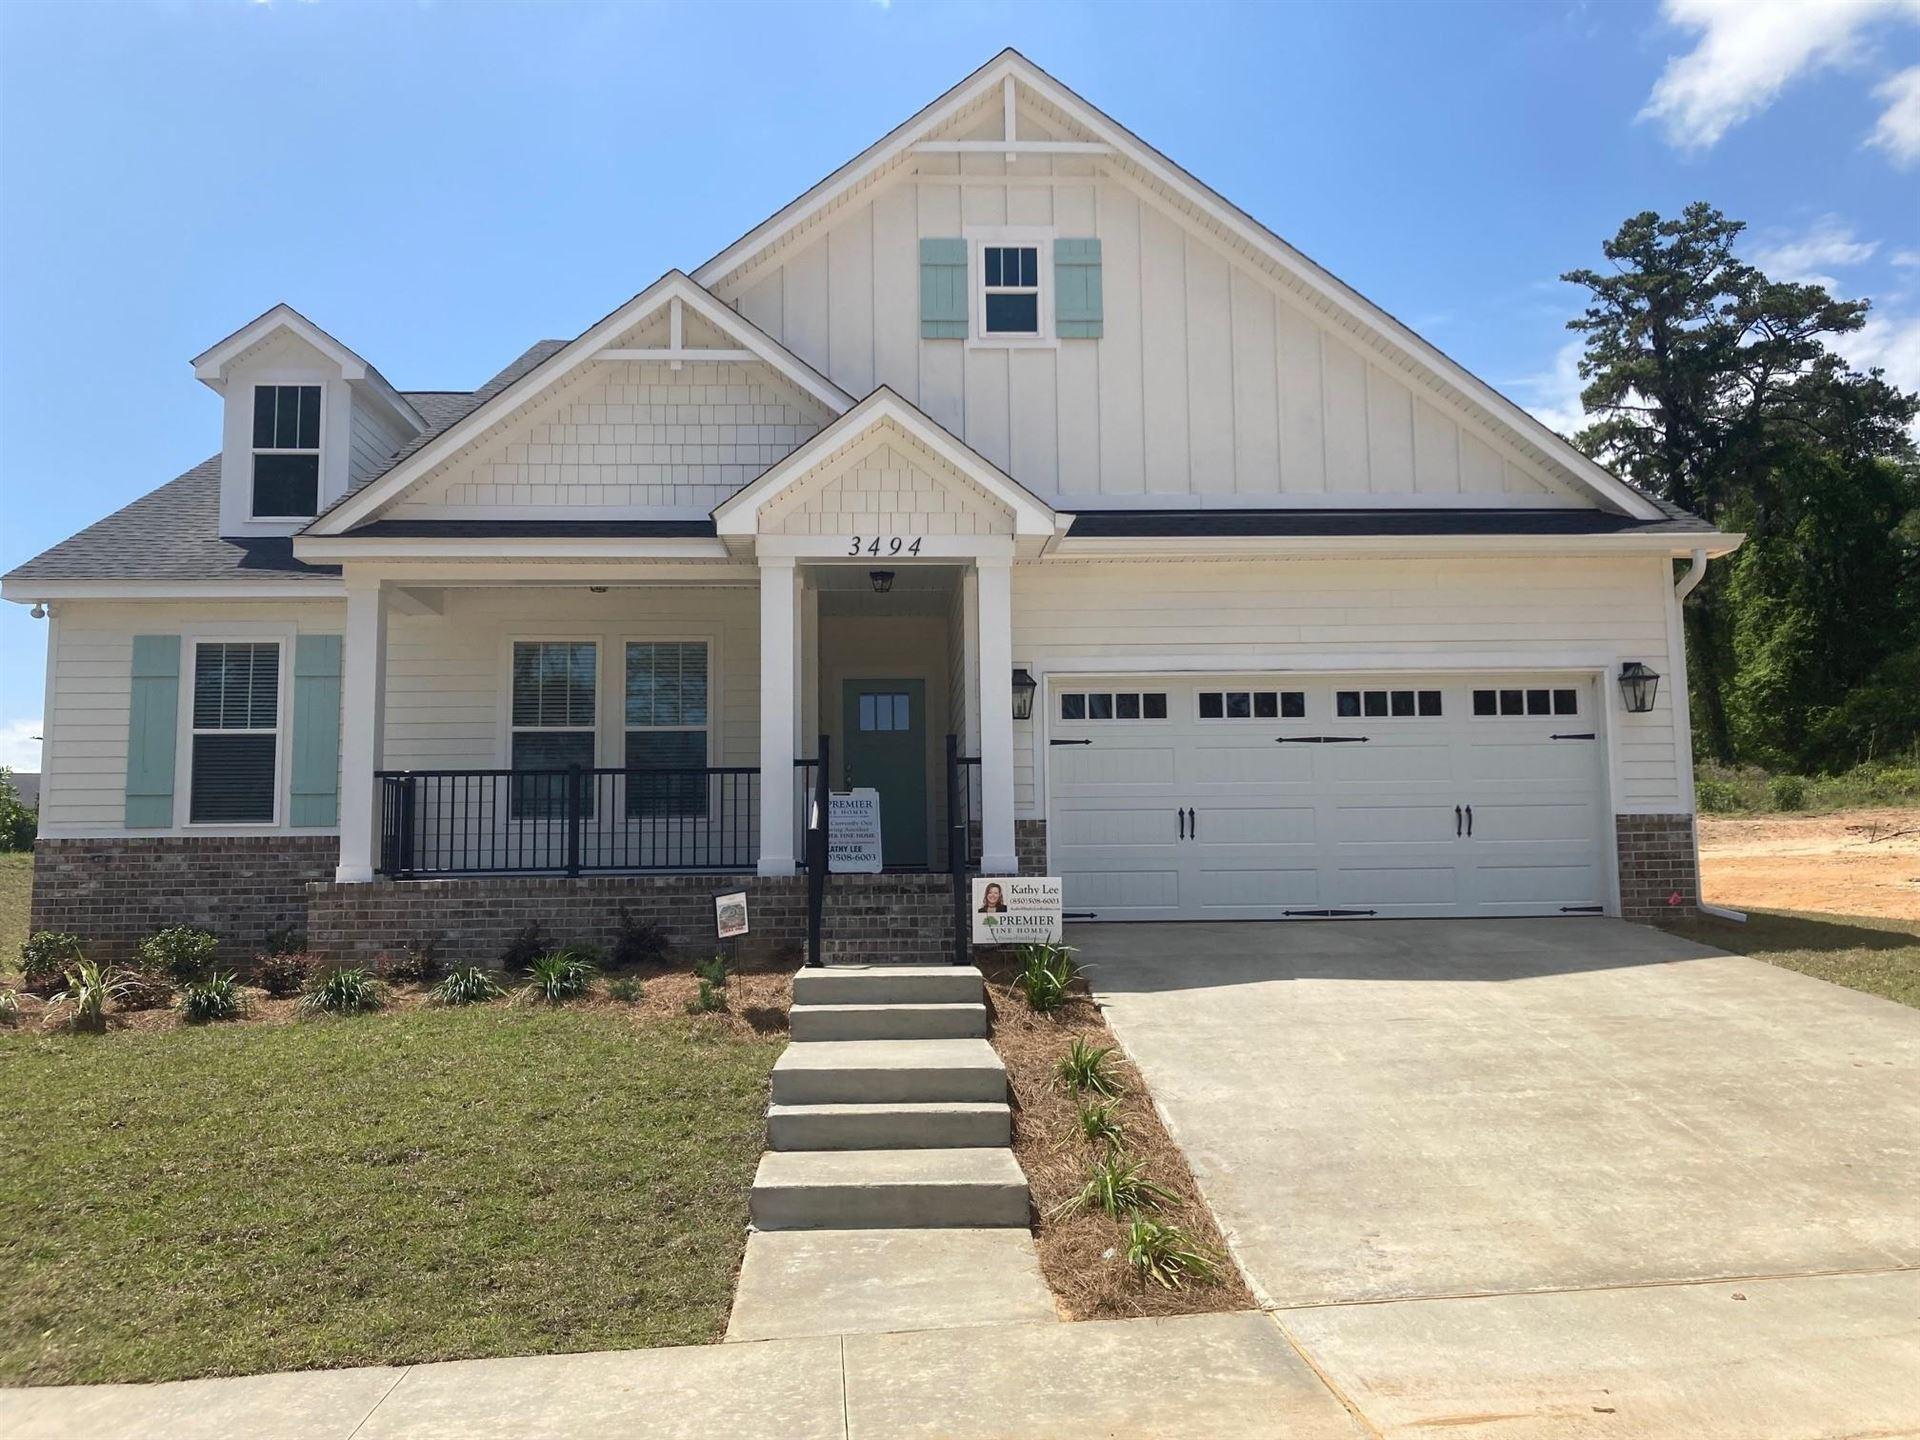 3494 Coneflower Drive, Tallahassee, FL 32311 - MLS#: 336356